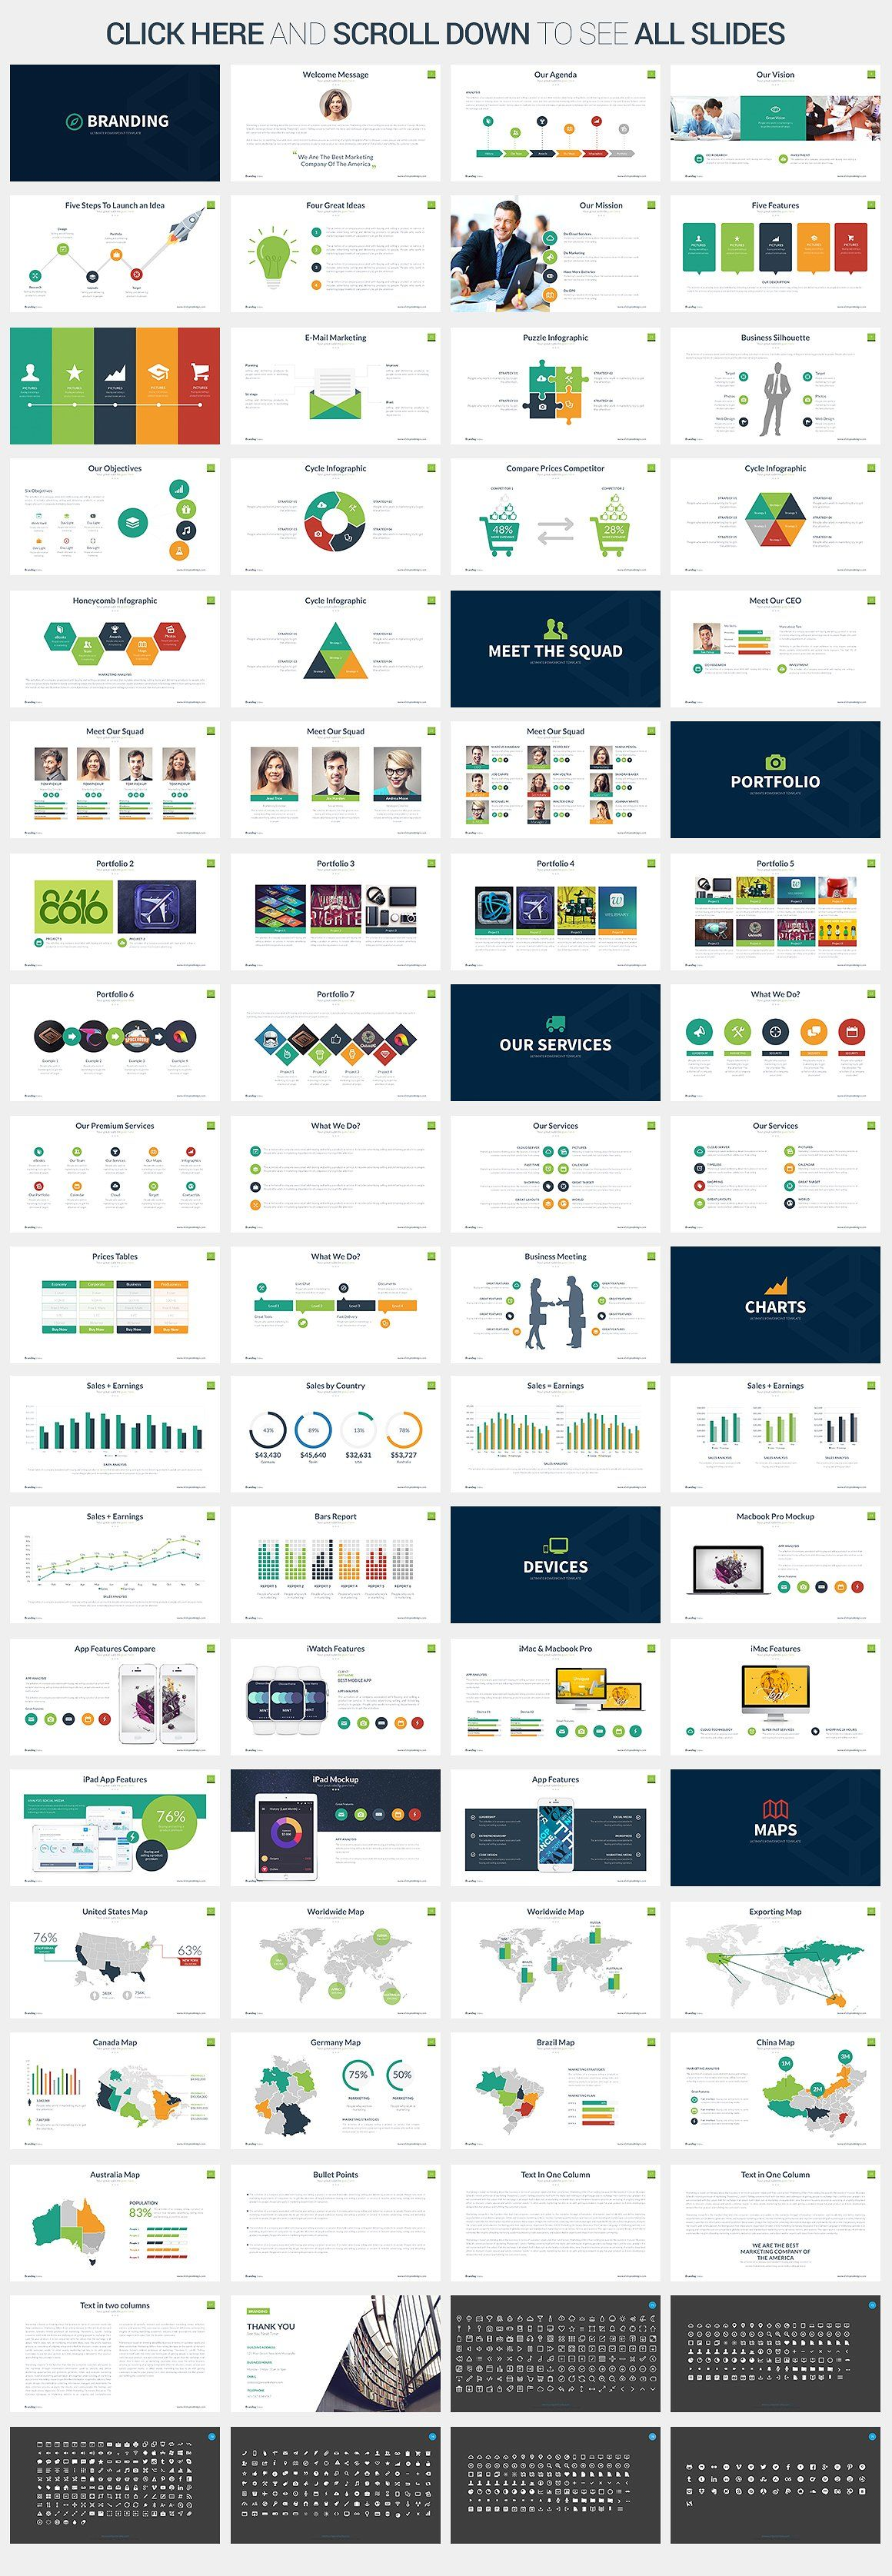 Branding - Keynote Template by SlidePro on @creativemarket | highs ...